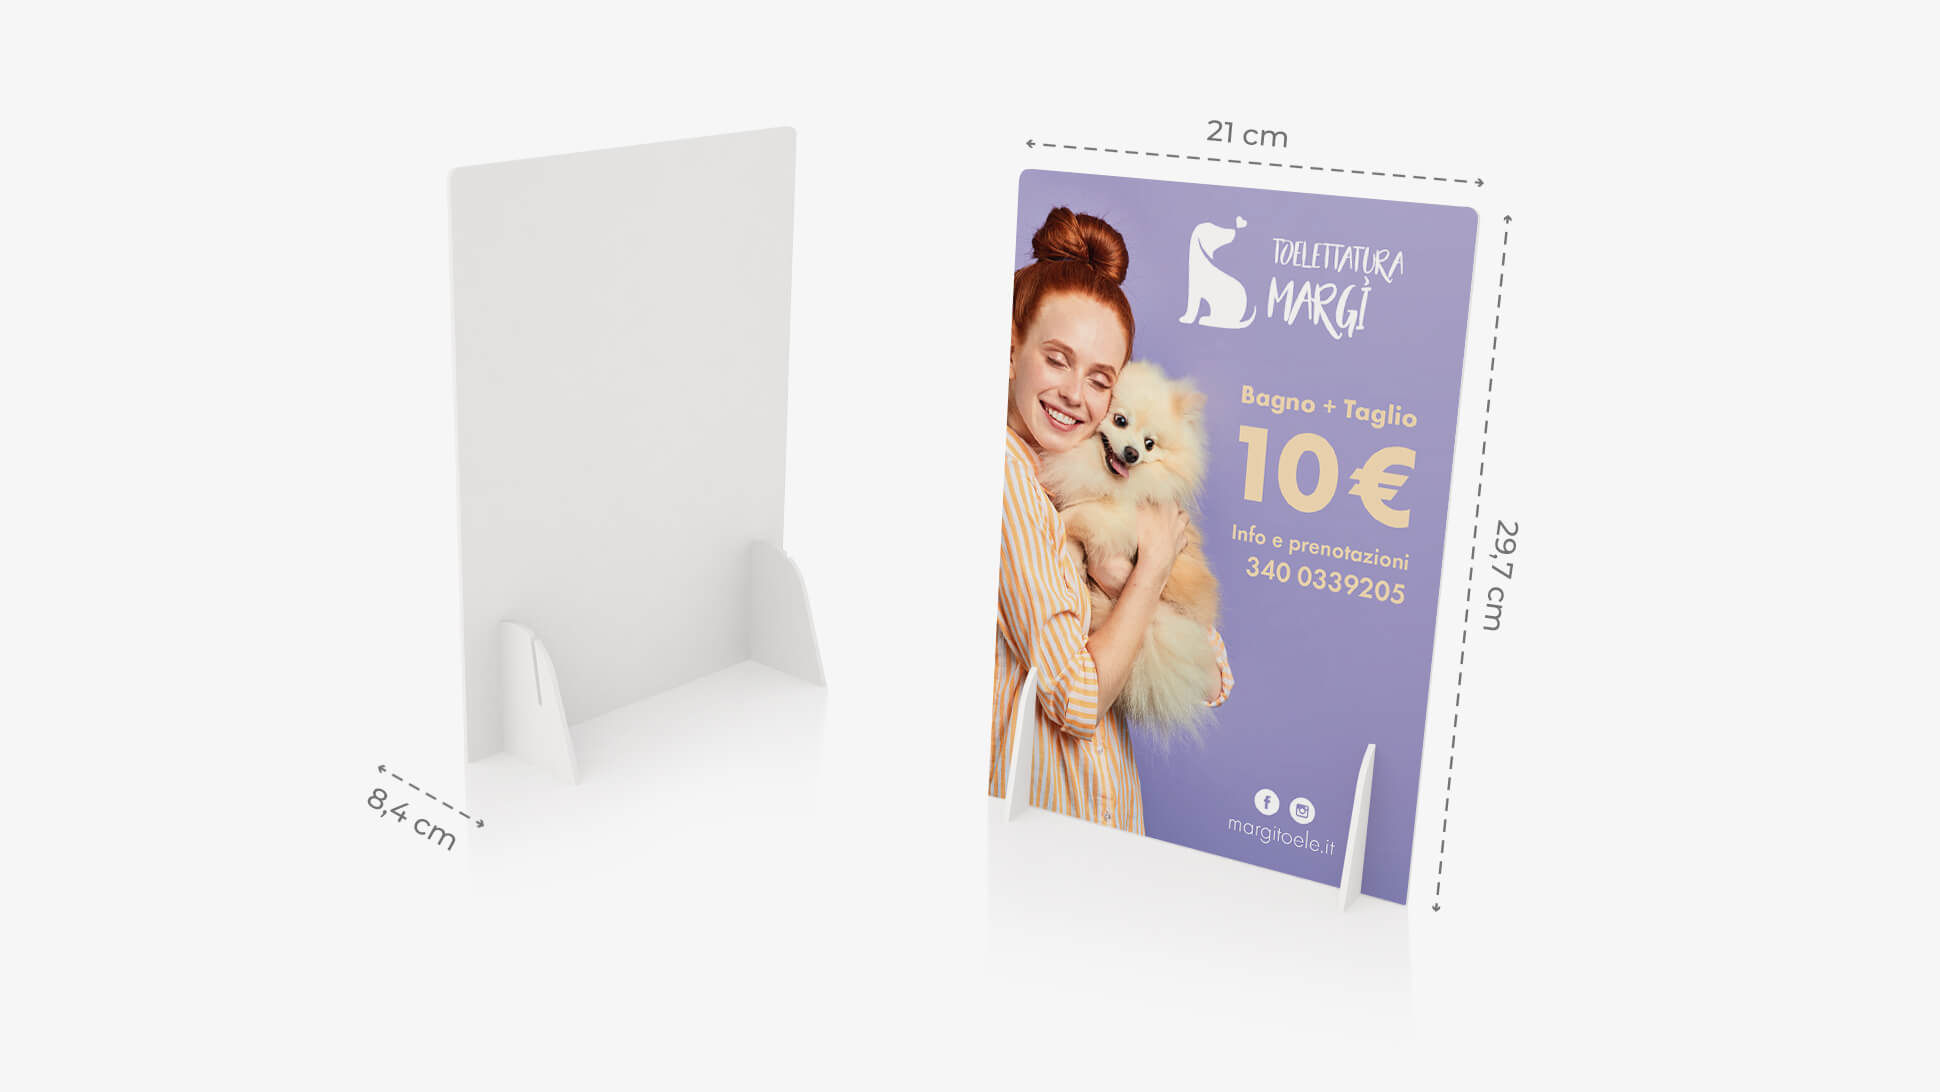 Display pvc bianco A4 con grafica | tictac.it